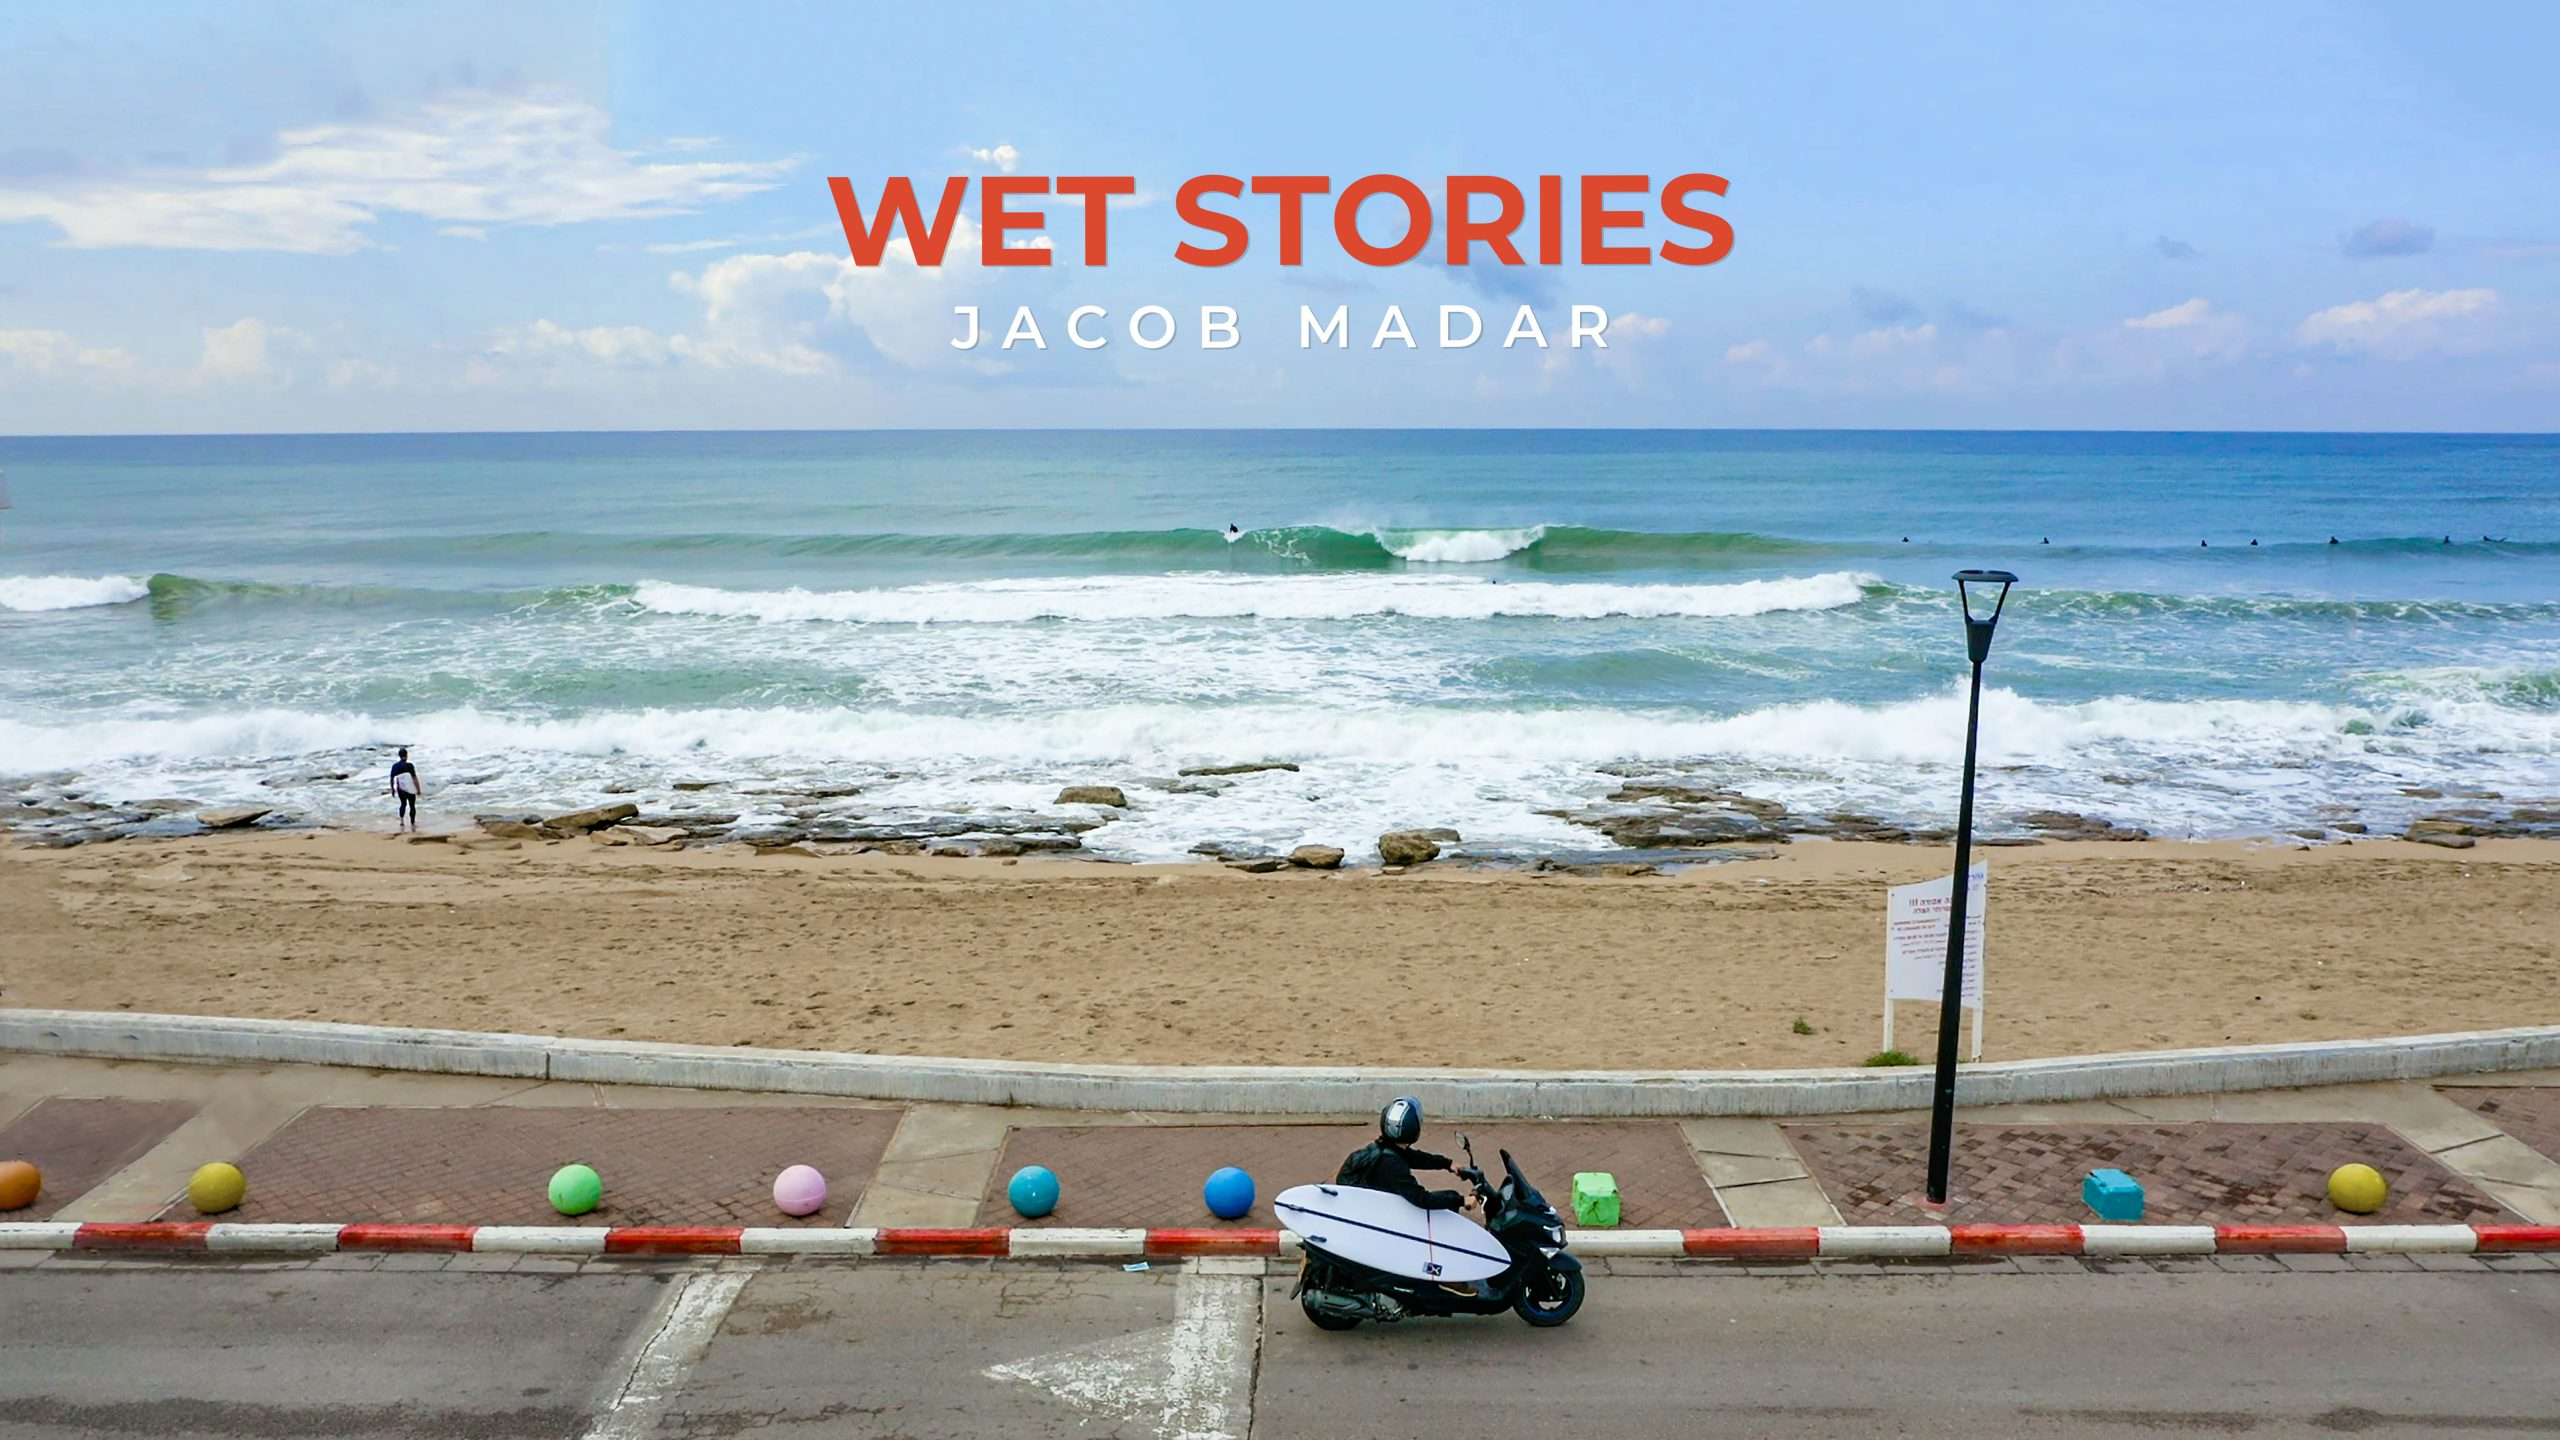 wet stories - jacob madar